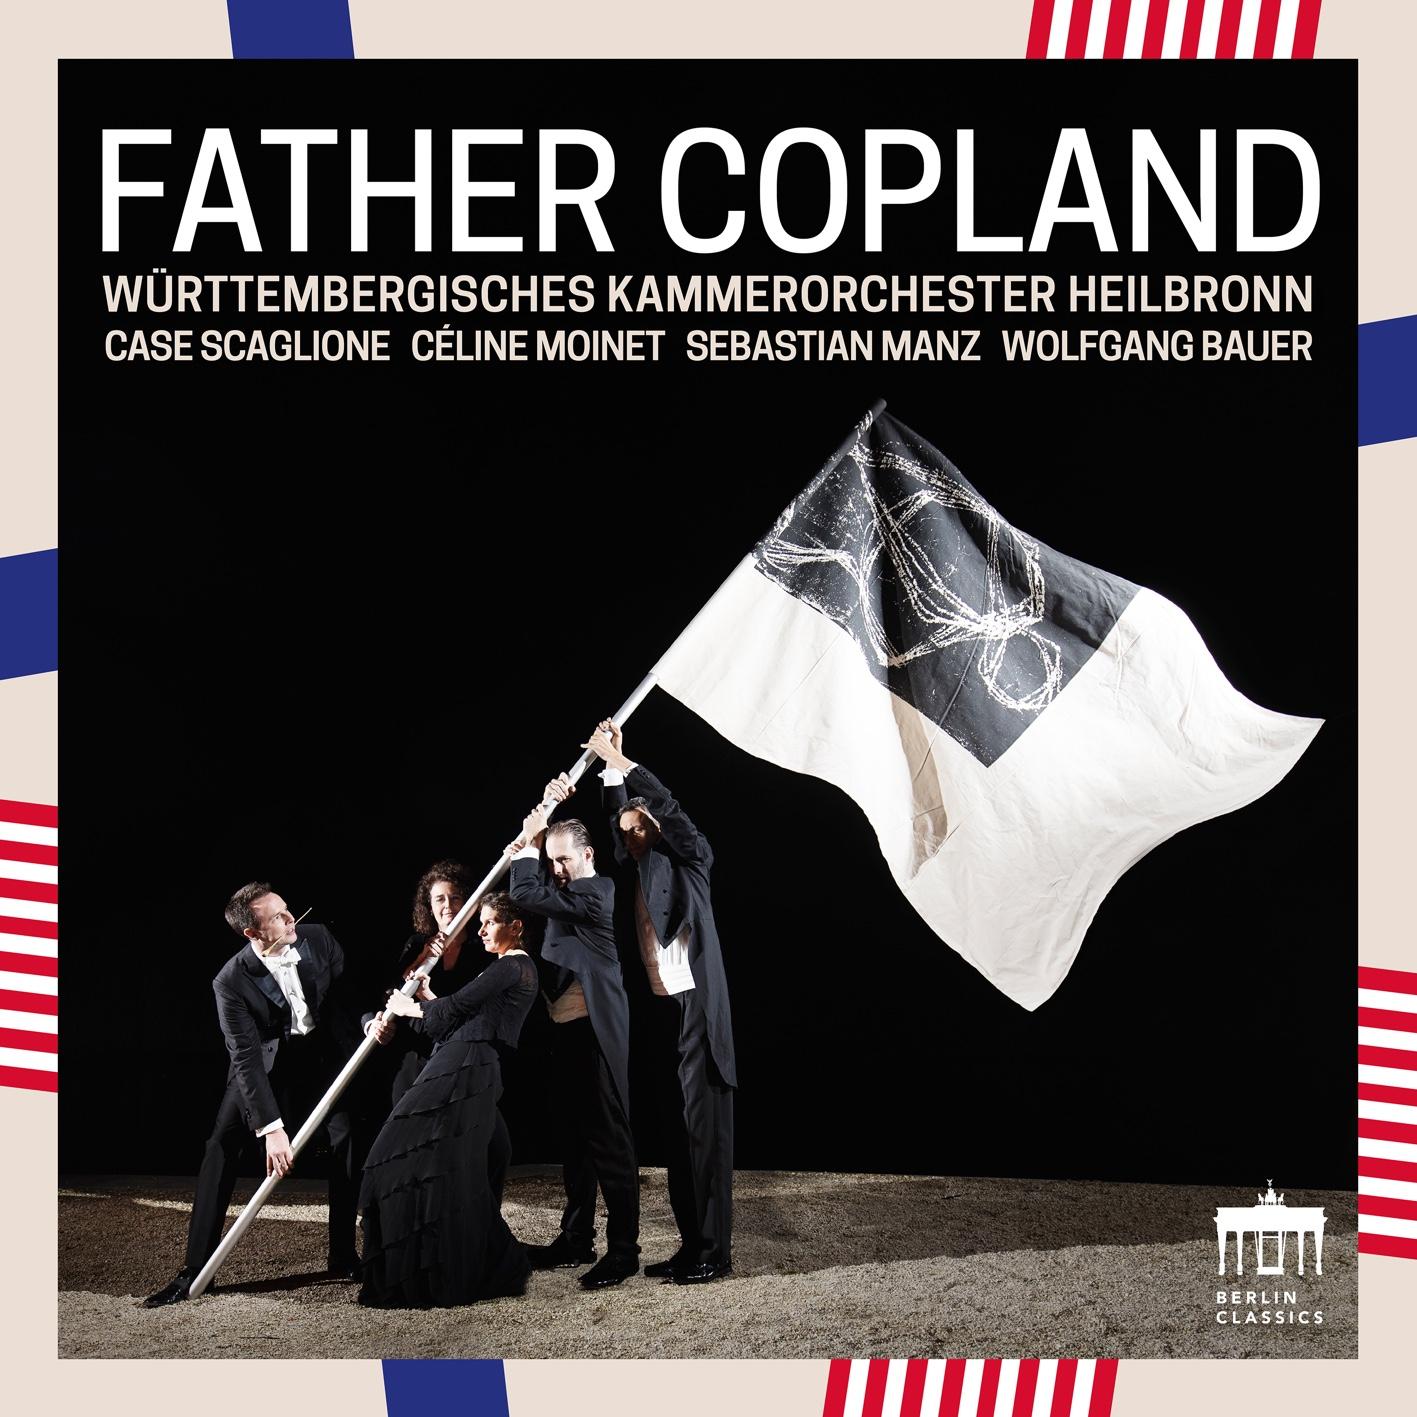 https://www.bkw-net.de/wp-content/uploads/2020/04/0301411BC_Cover_FatherCopland.jpg